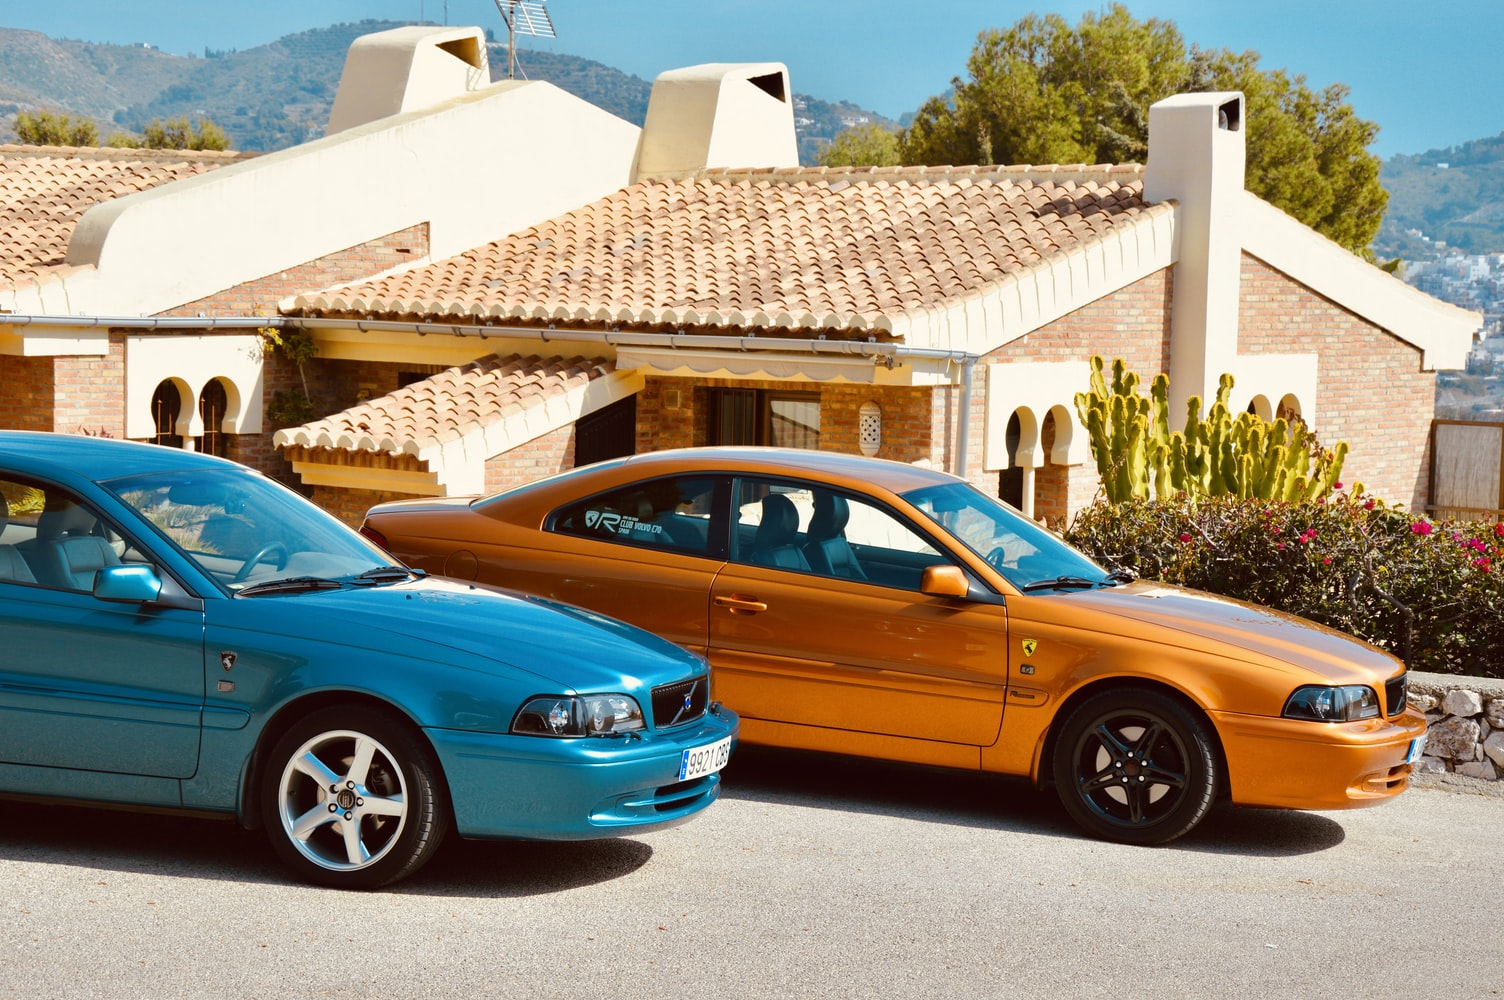 Volvo 70 C70 Coupe 1997  ManuelMena Unsplashphoto photo-1574935231874-afe5955f338b